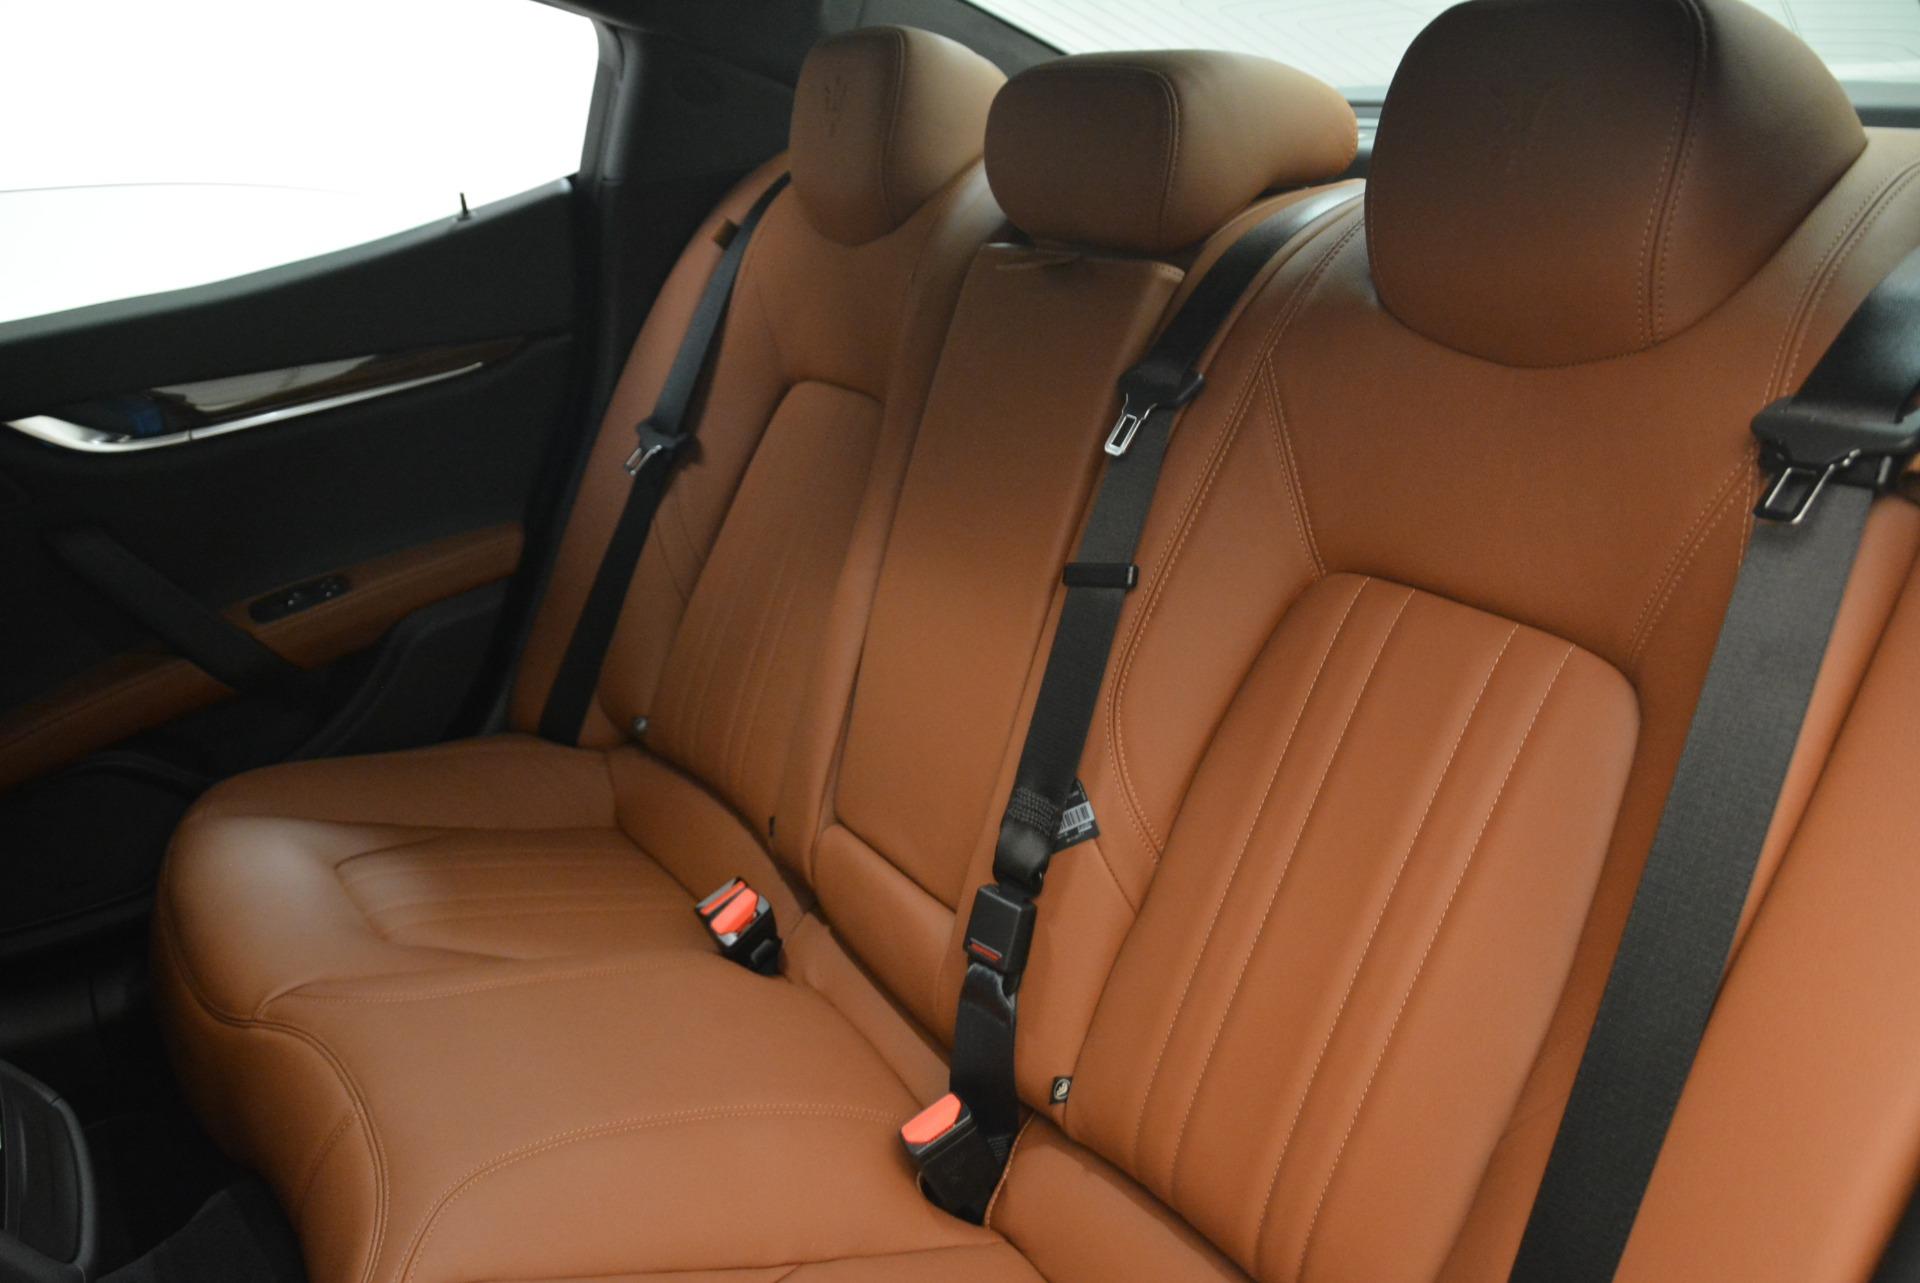 Used 2019 Maserati Ghibli S Q4 For Sale In Greenwich, CT 2739_p19